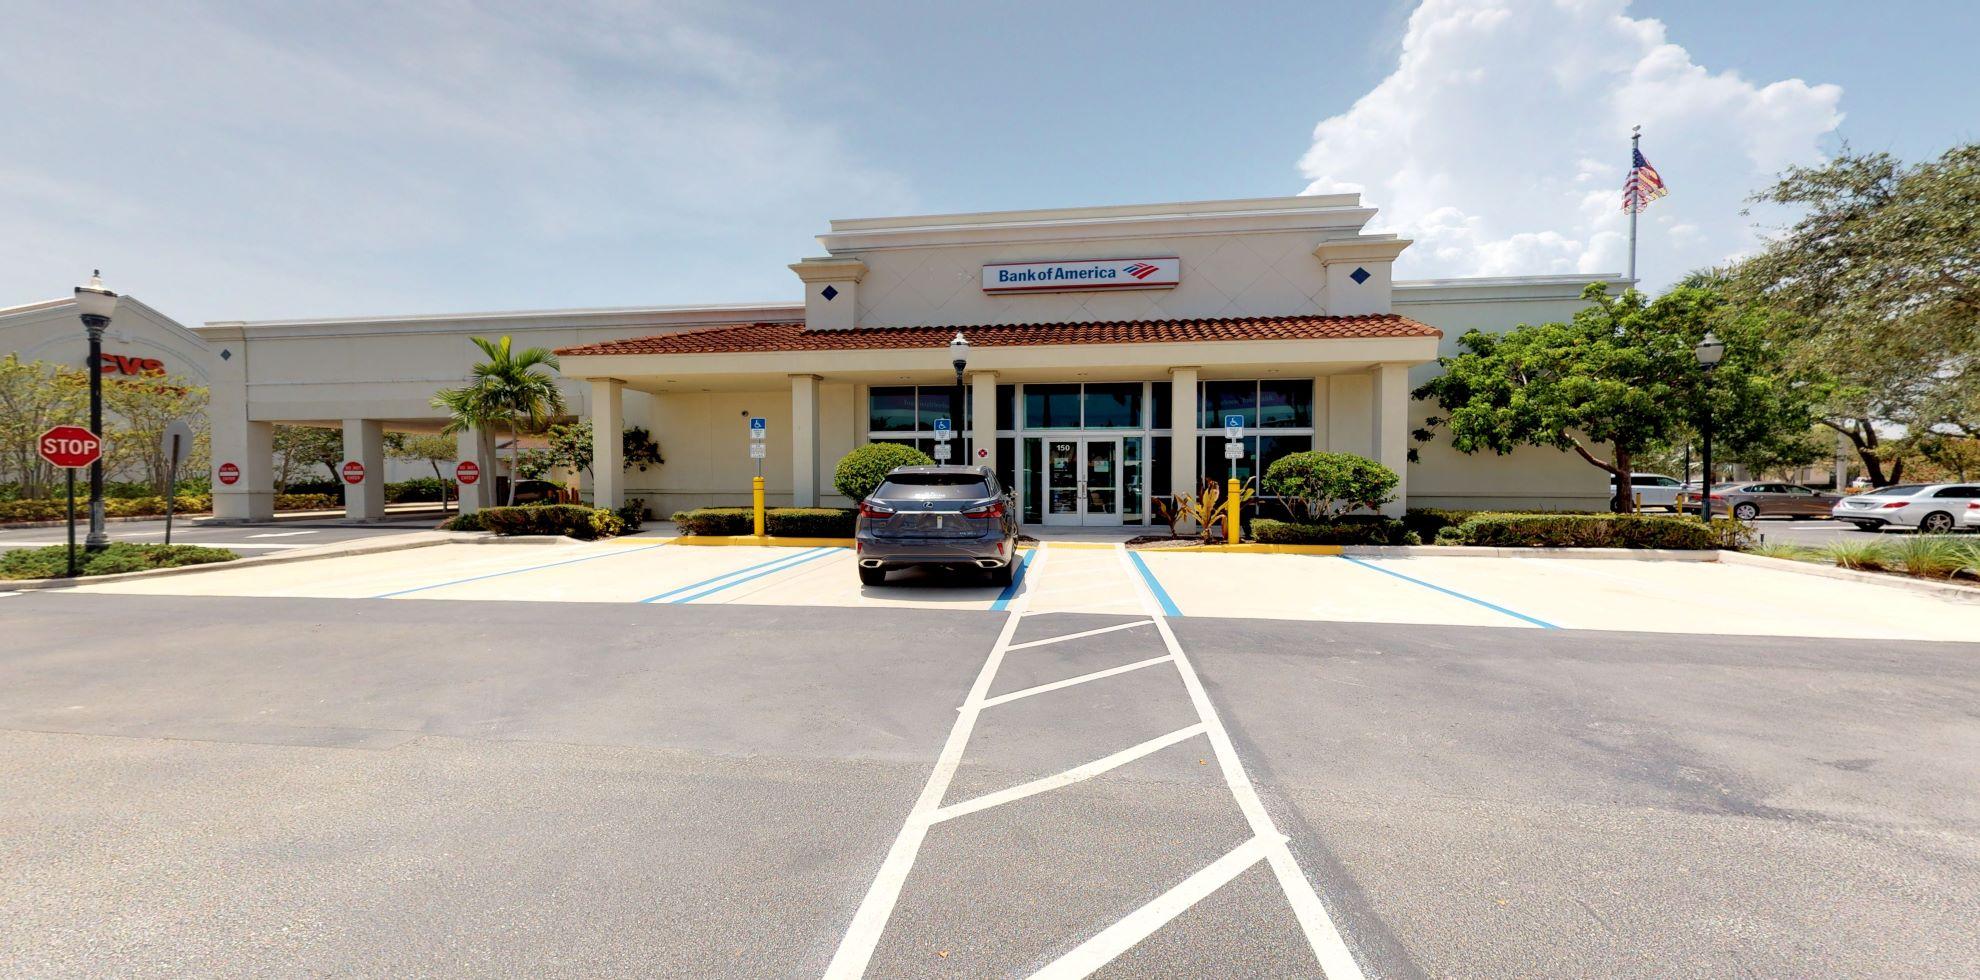 Bank of America financial center with drive-thru ATM | 150 Tequesta Dr, Tequesta, FL 33469